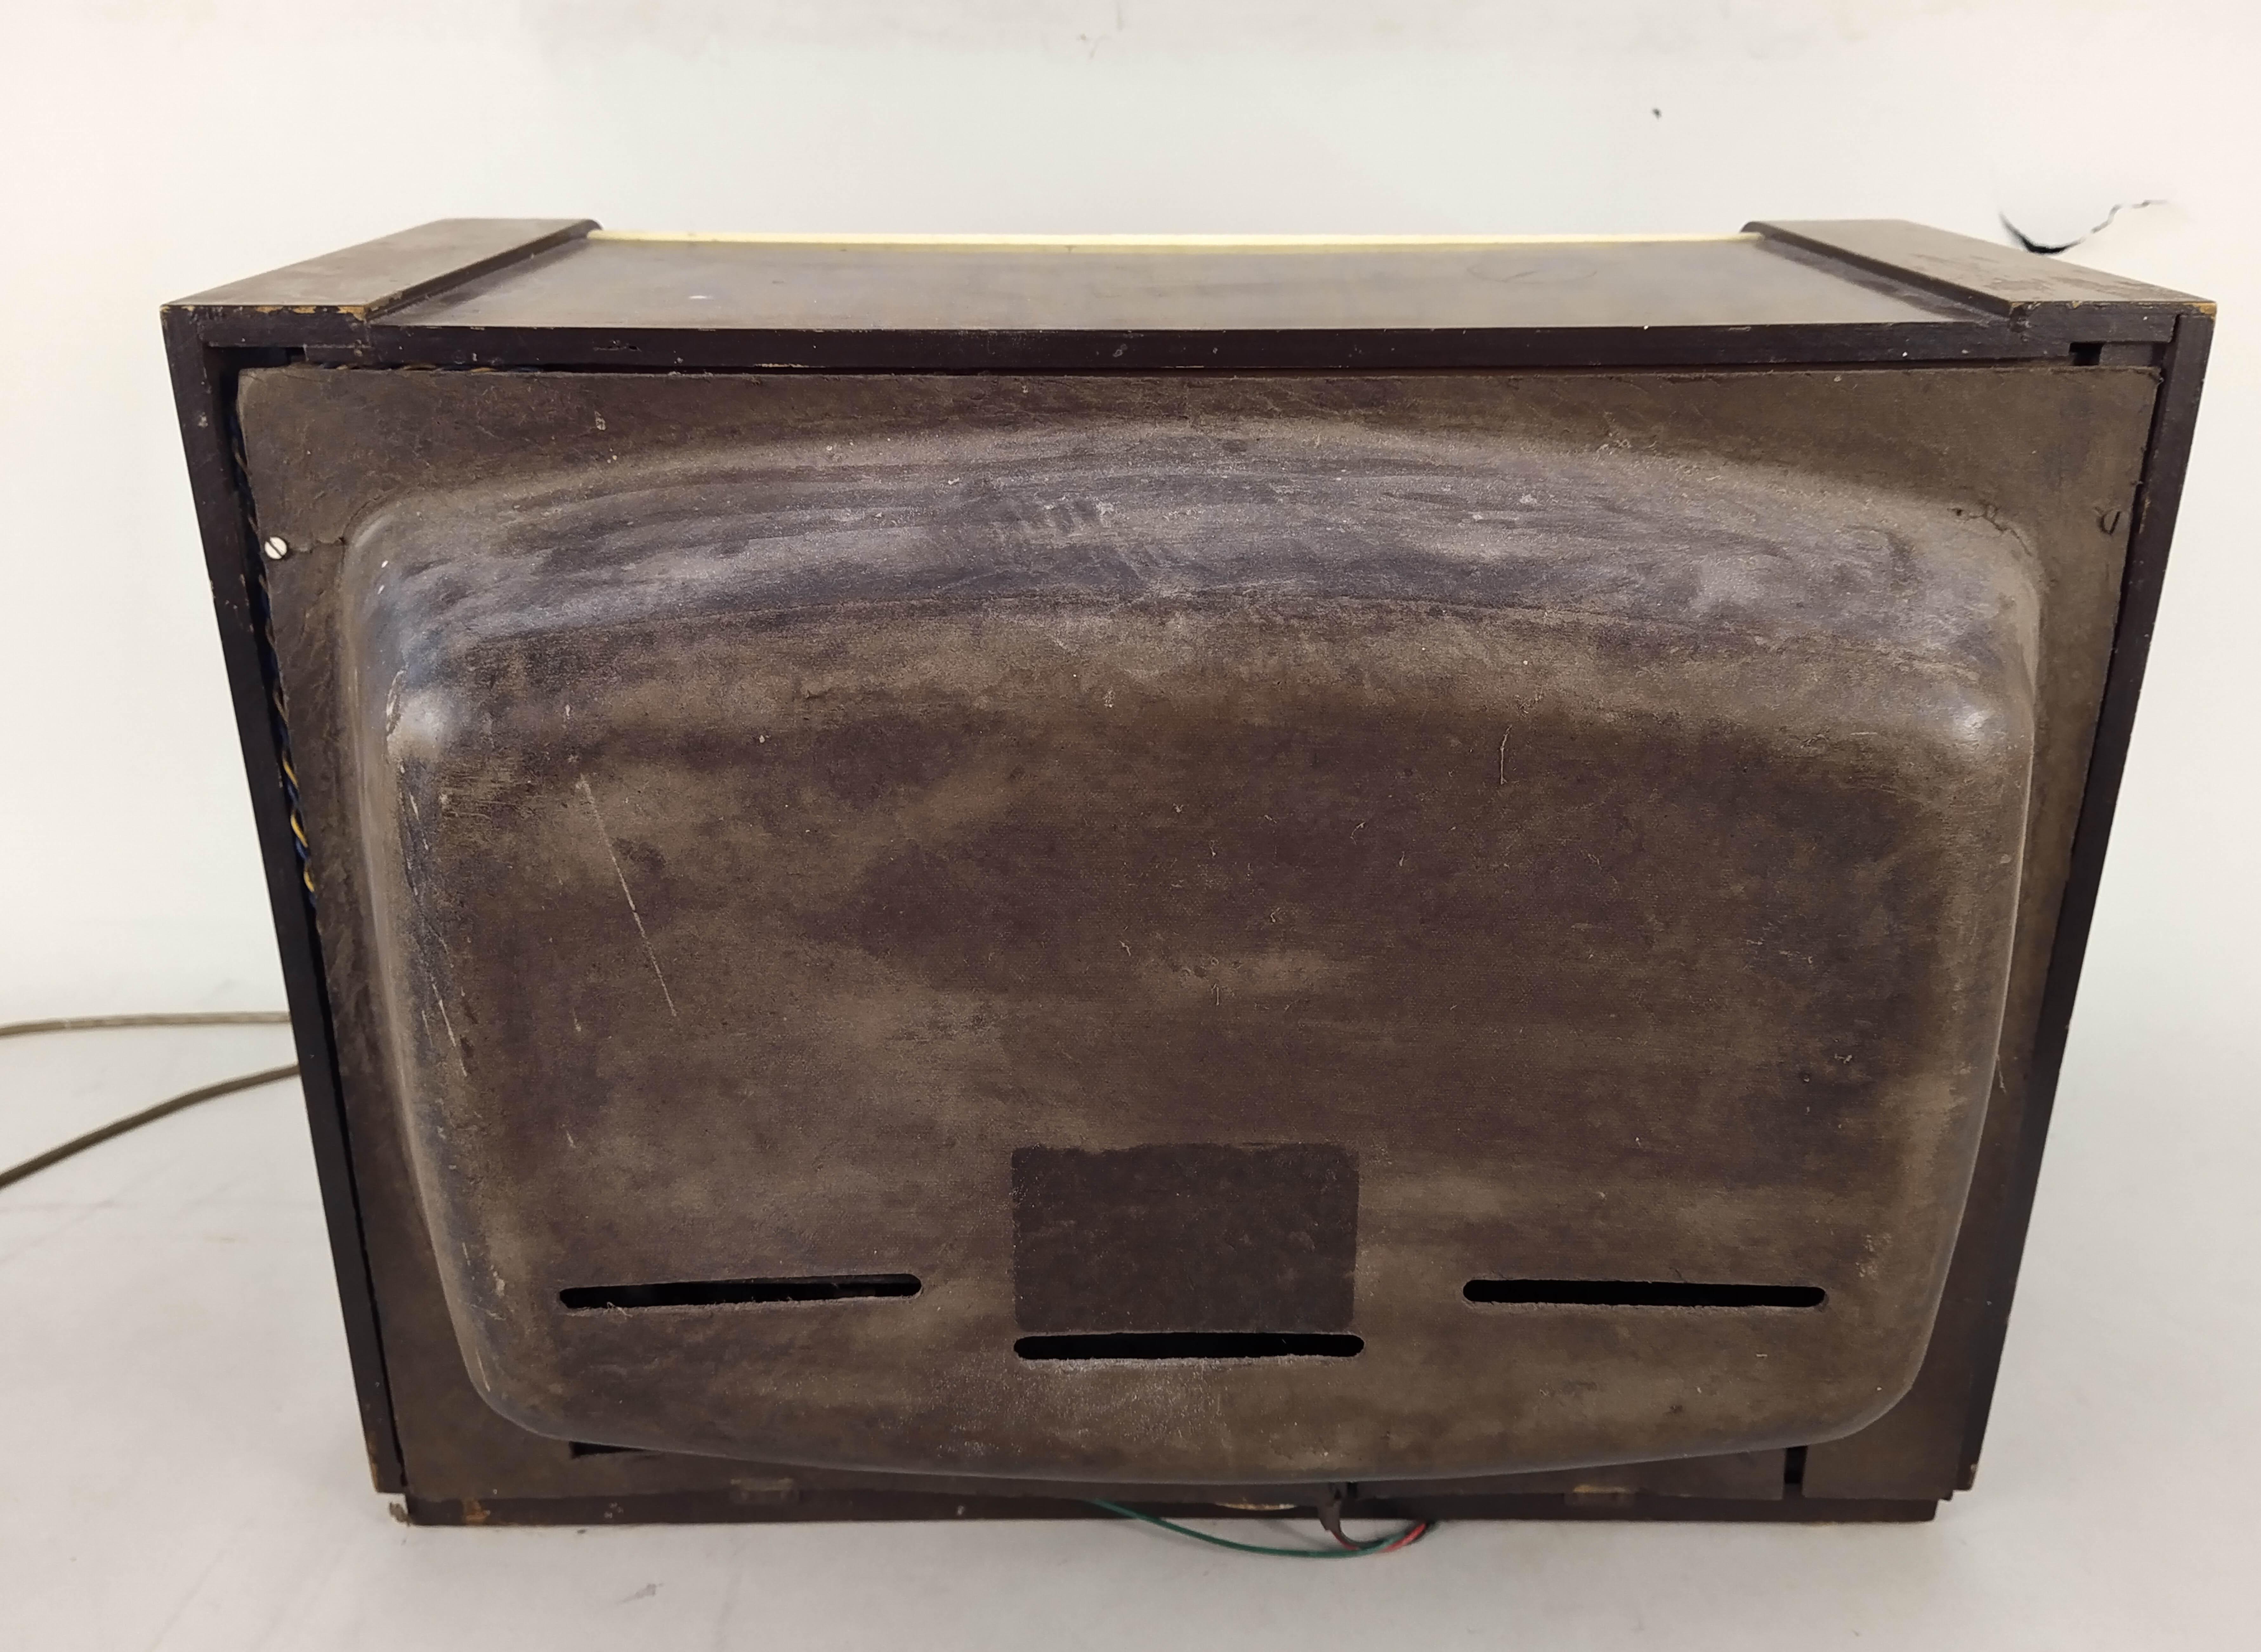 A large vintage 'Regentone' transistor radio - Image 3 of 3